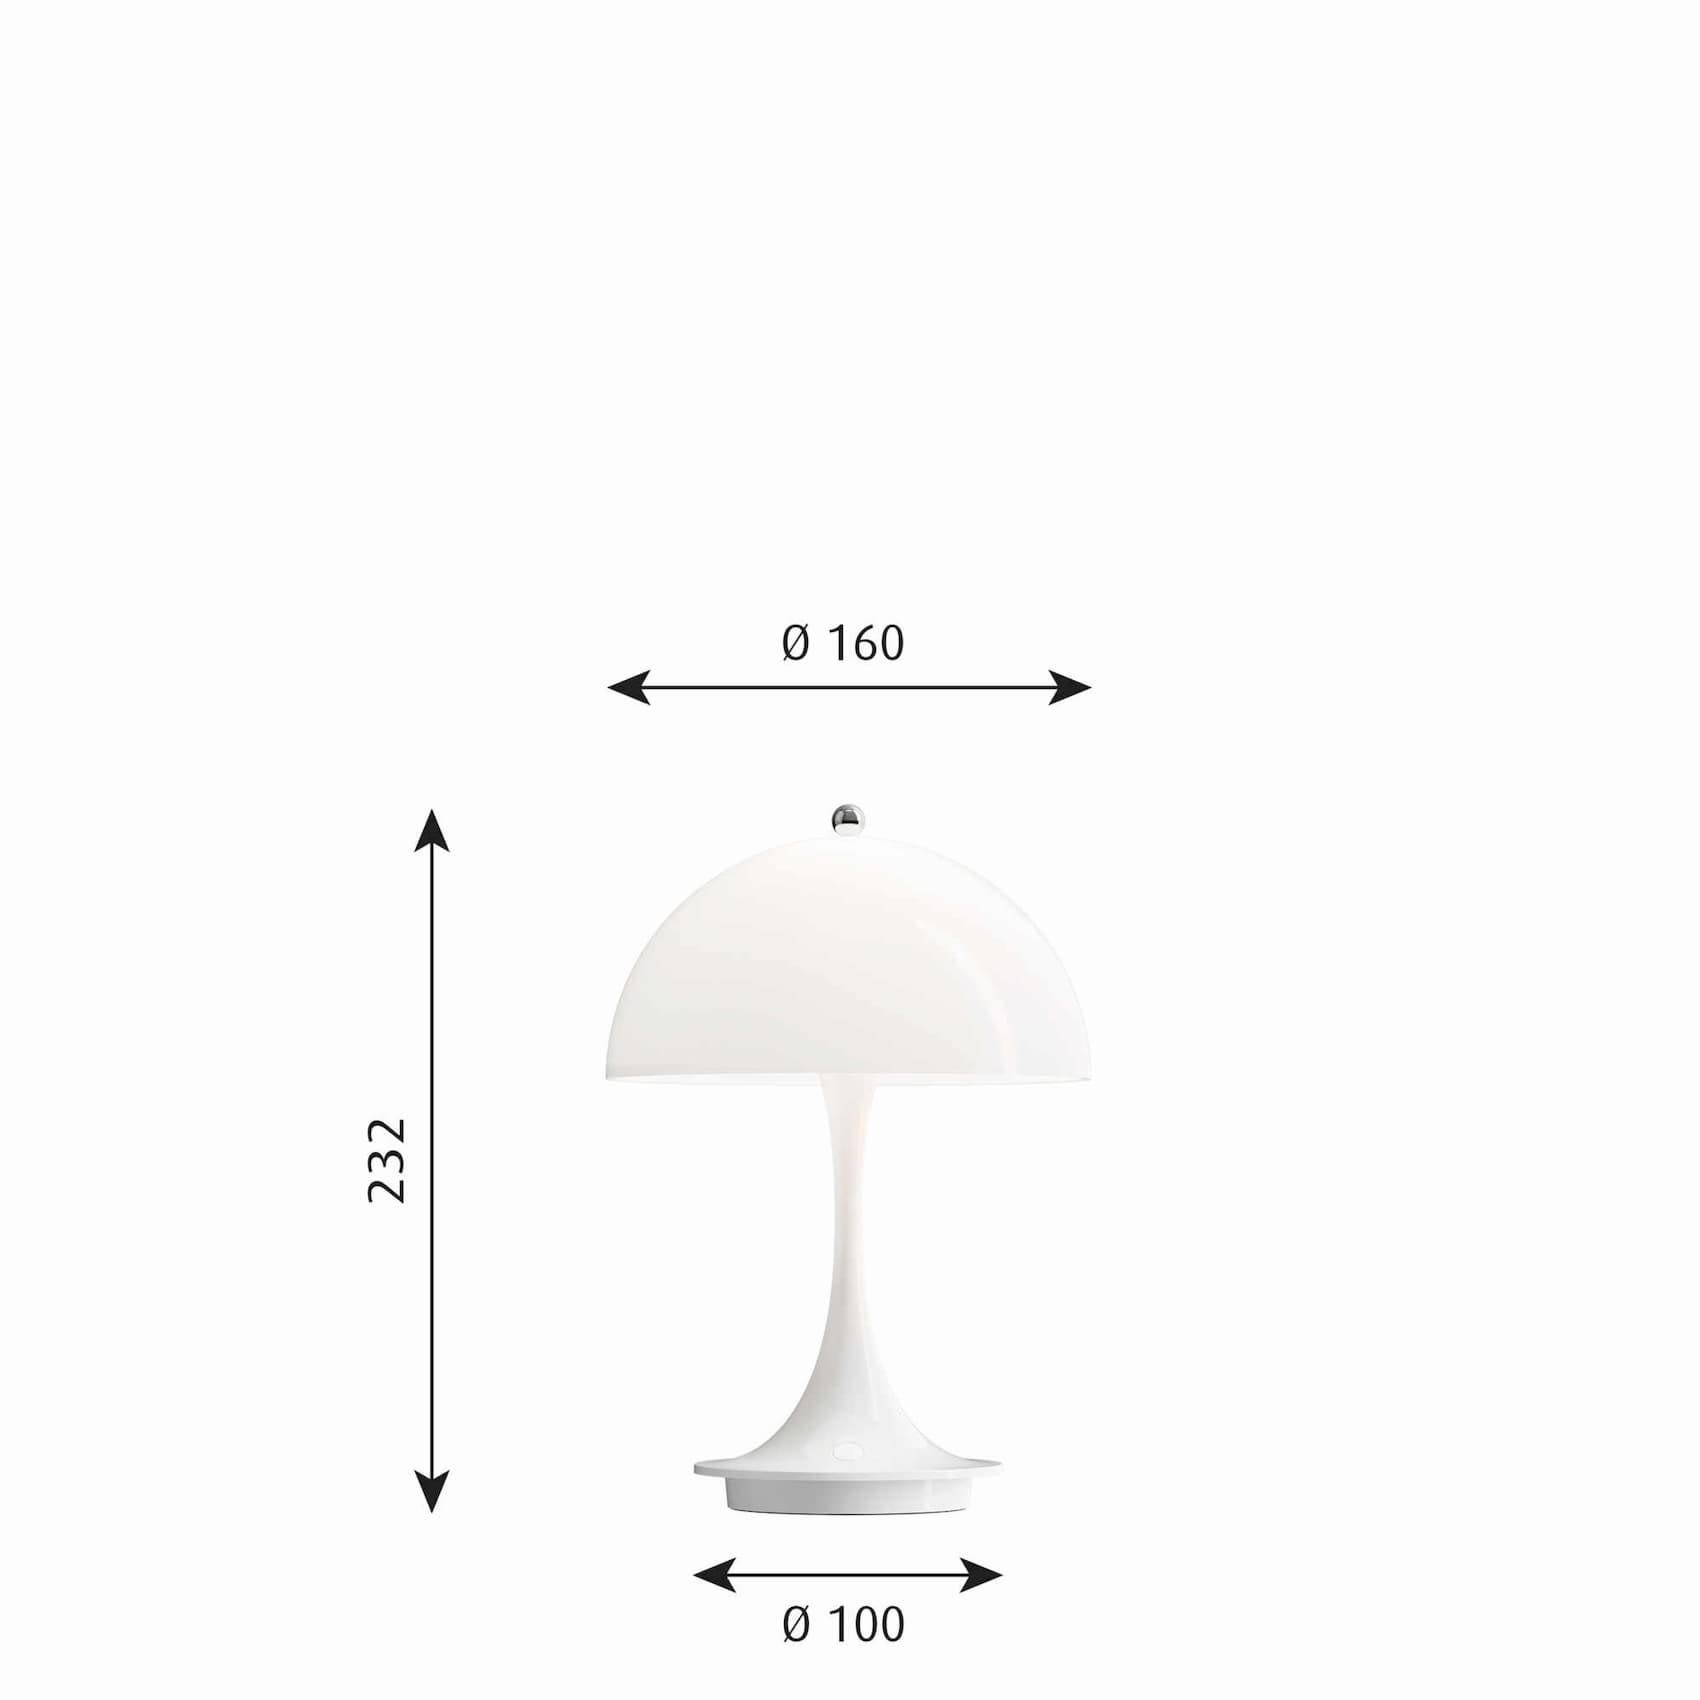 louis-poulsen-panthella-portable-lamp-dimensions